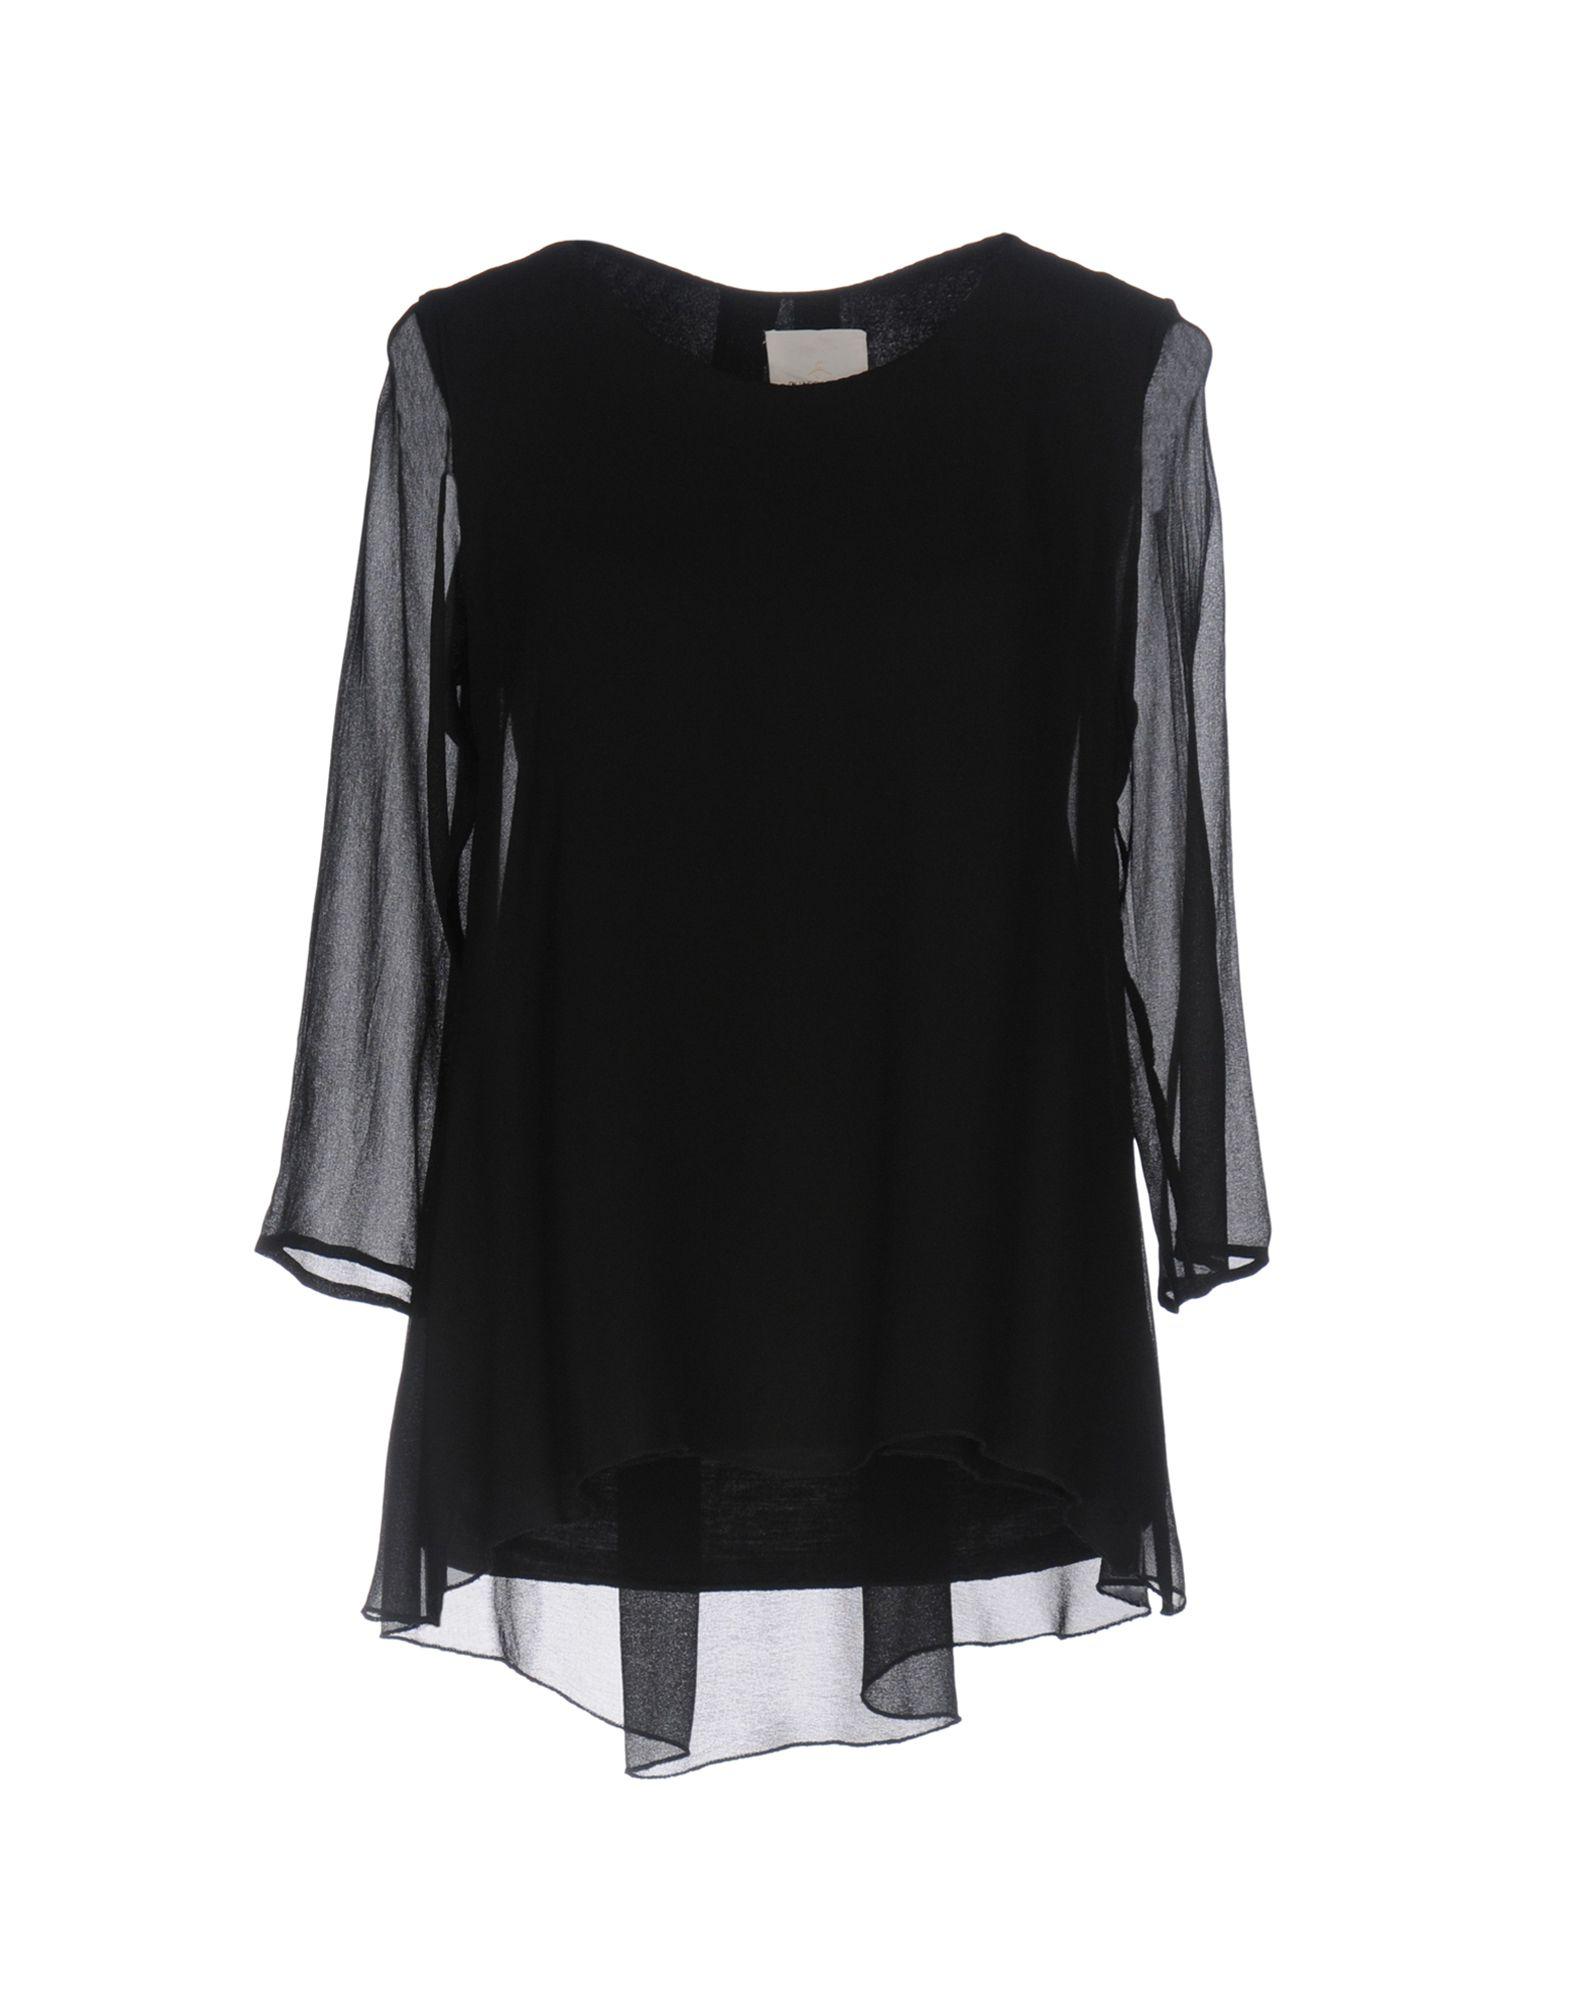 GUARDAROBA by ANIYE BY Damen Bluse Farbe Schwarz Größe 4